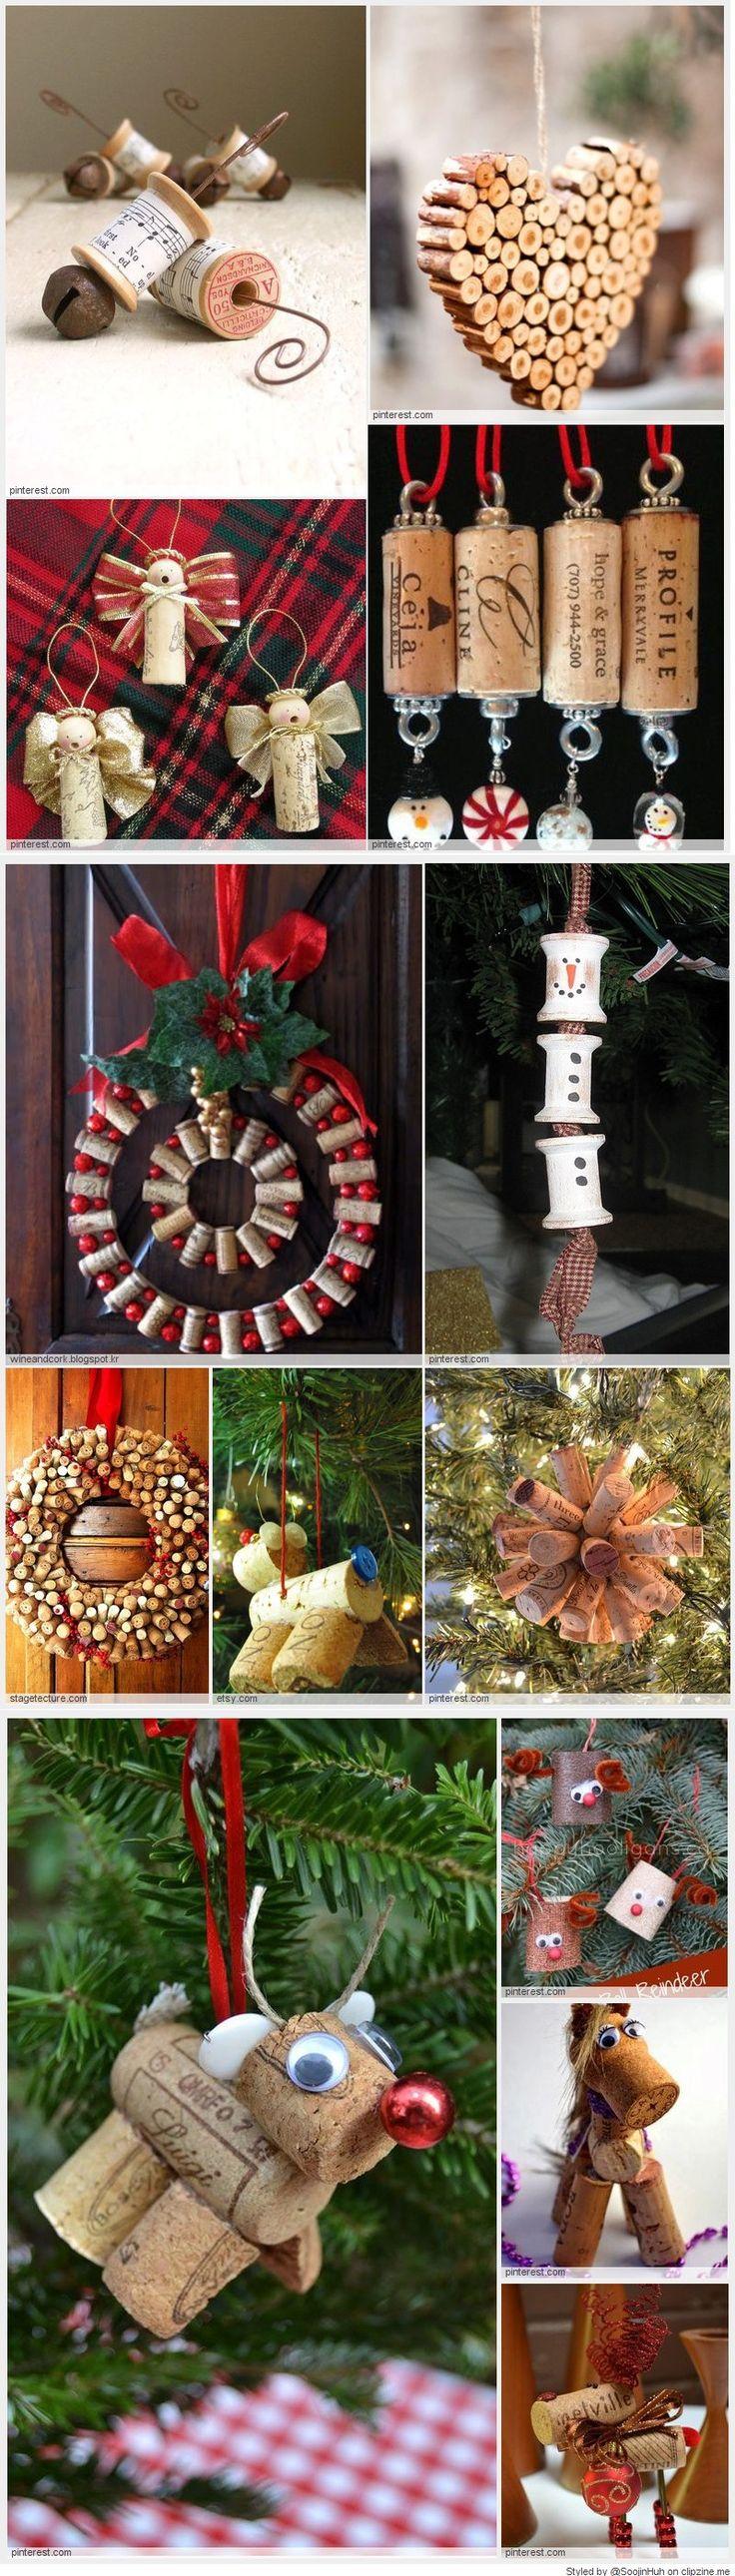 Cork christmas decorations - Easy Cork Christmas Ornaments